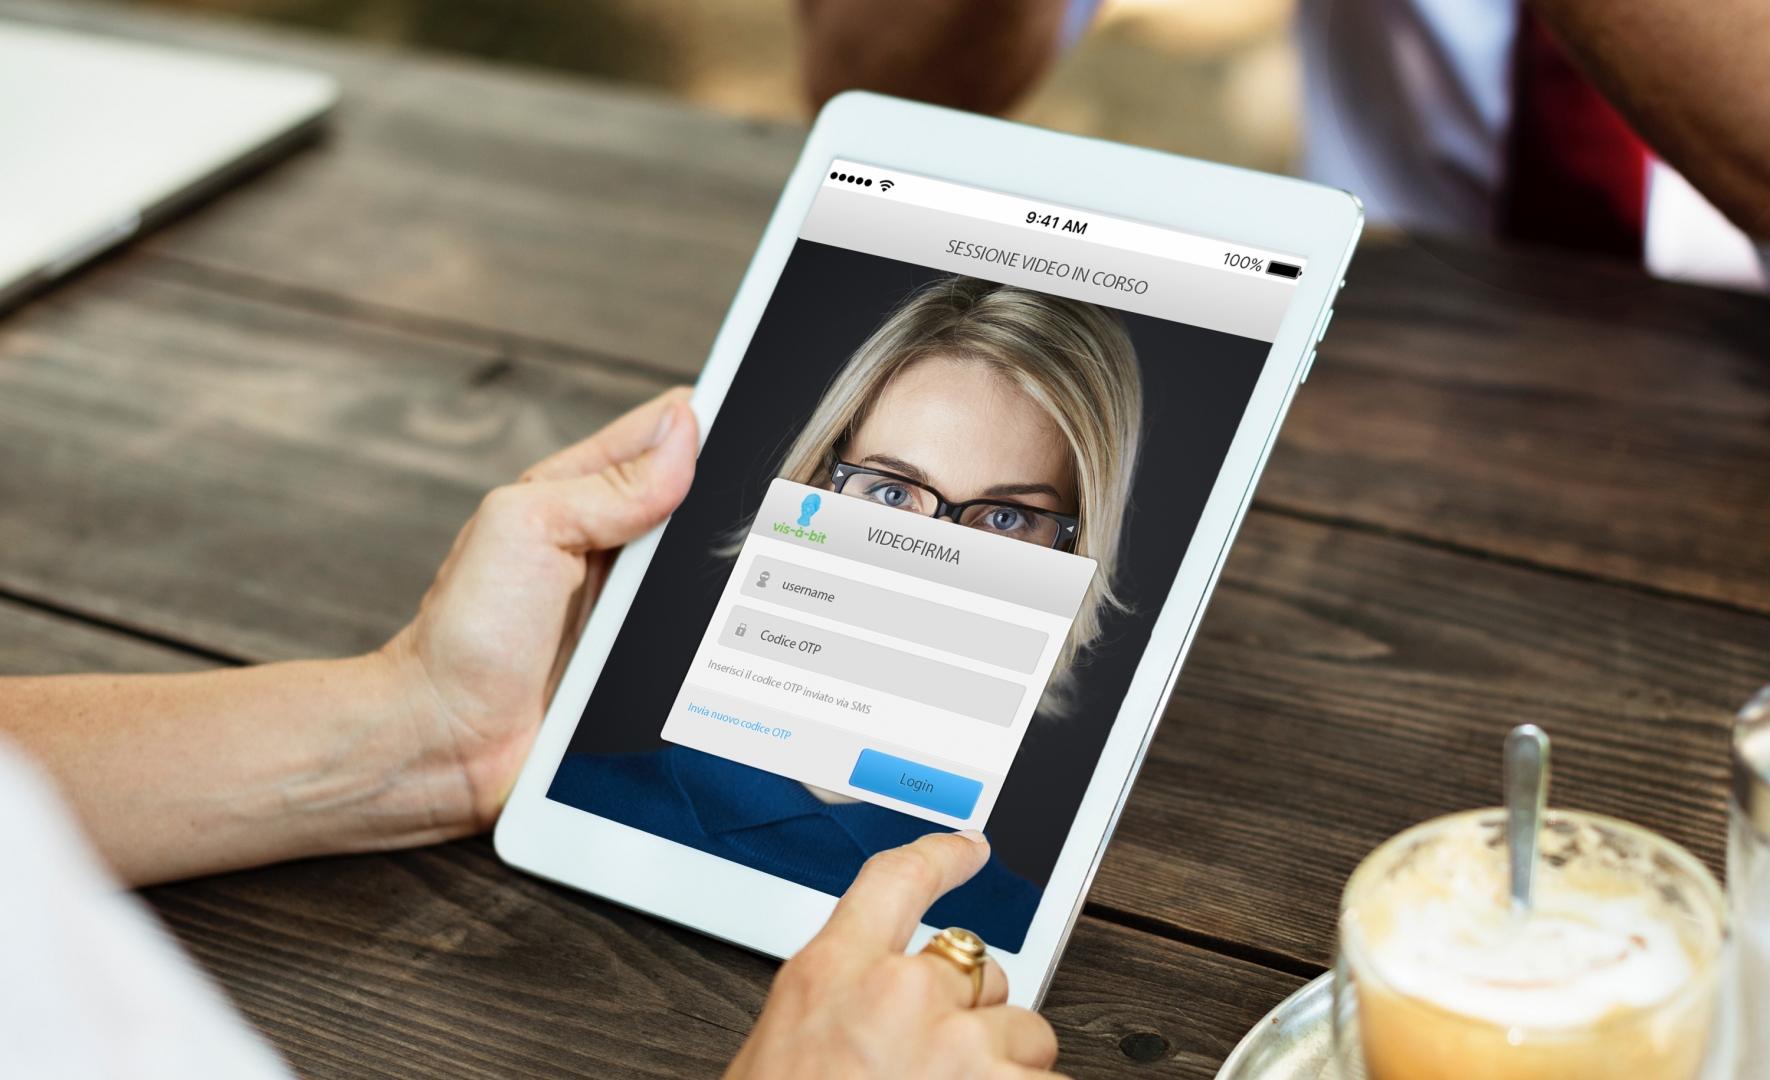 Video-relation, la video-chat certificata